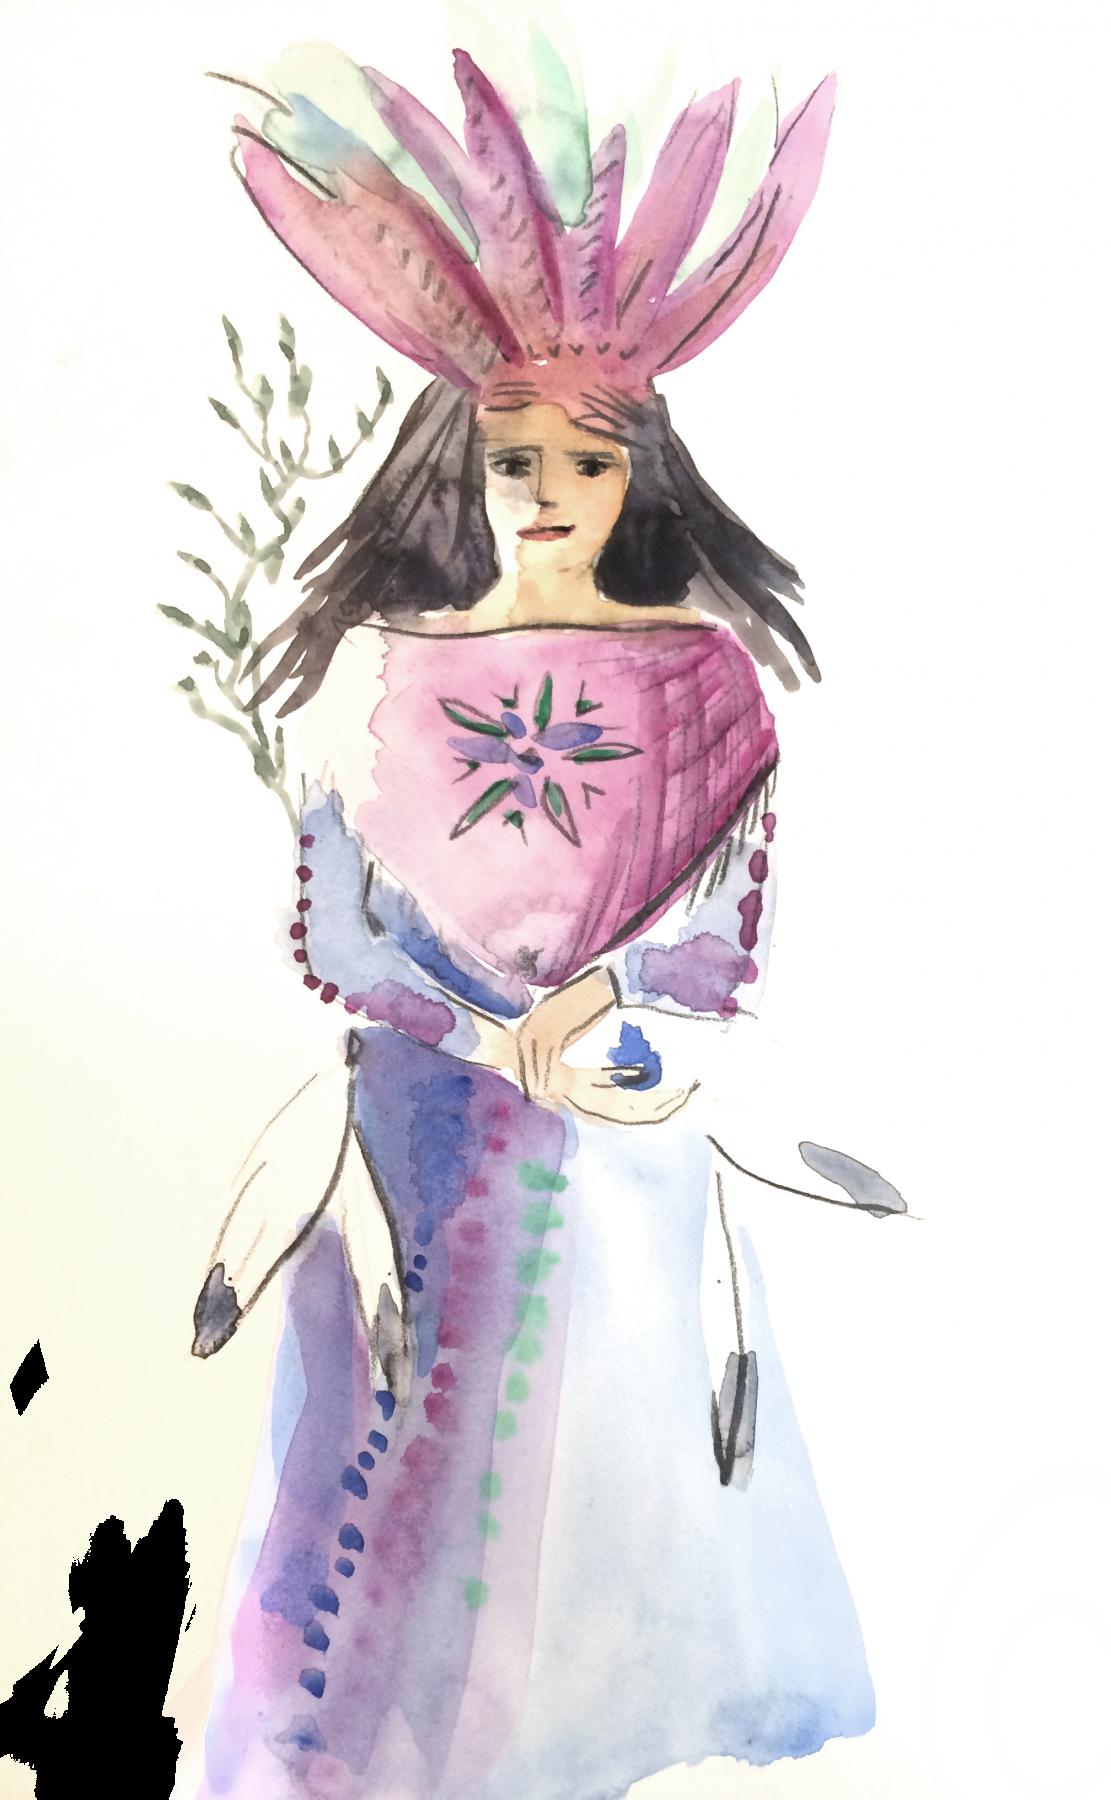 Femme sacree